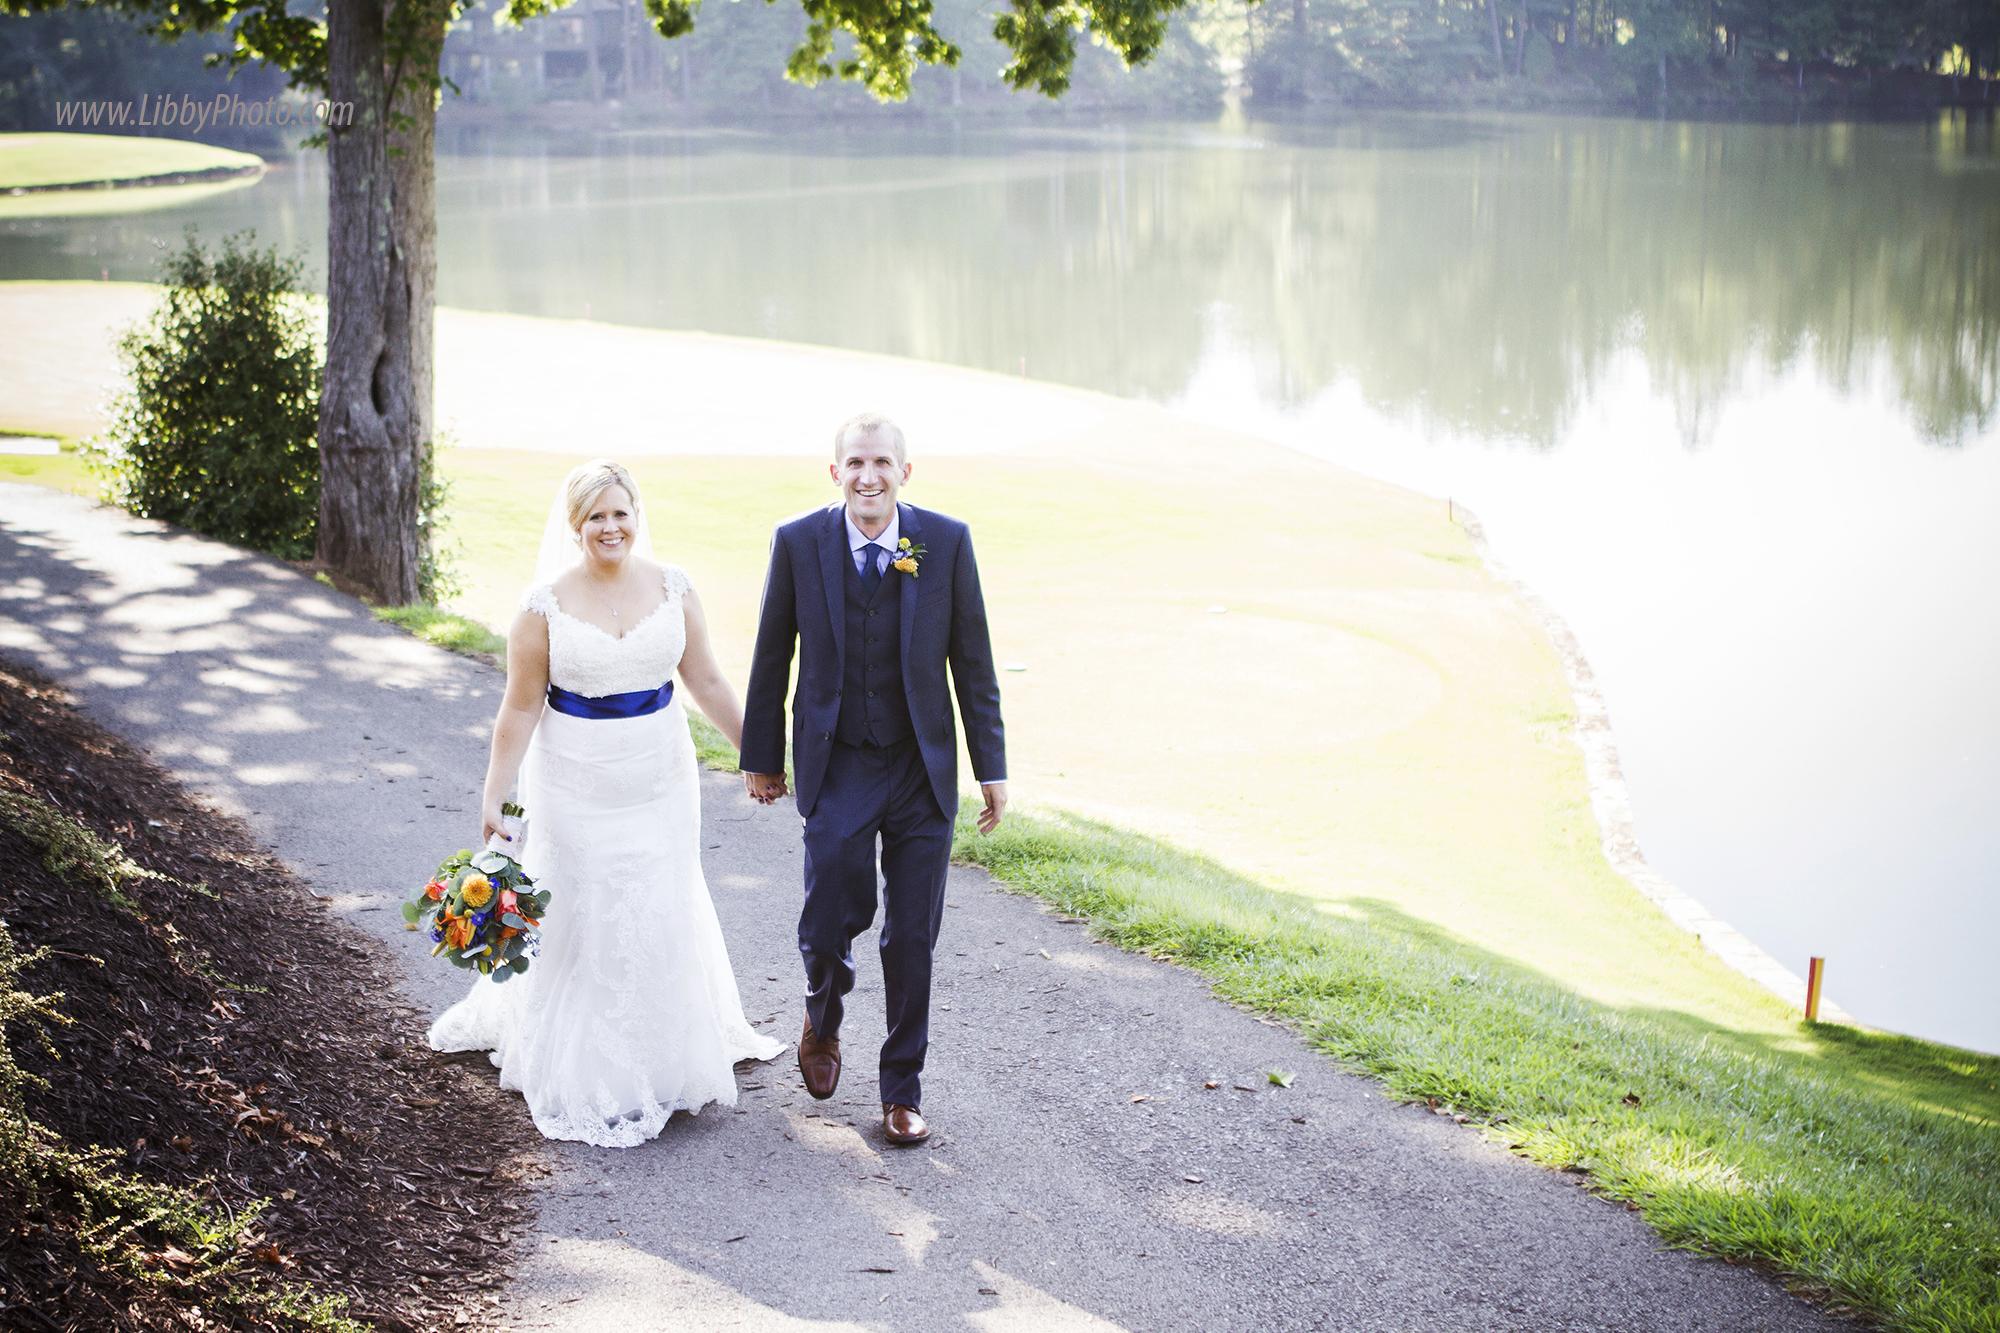 Atlanta wedding photography, Libbyphoto11 (15).jpg